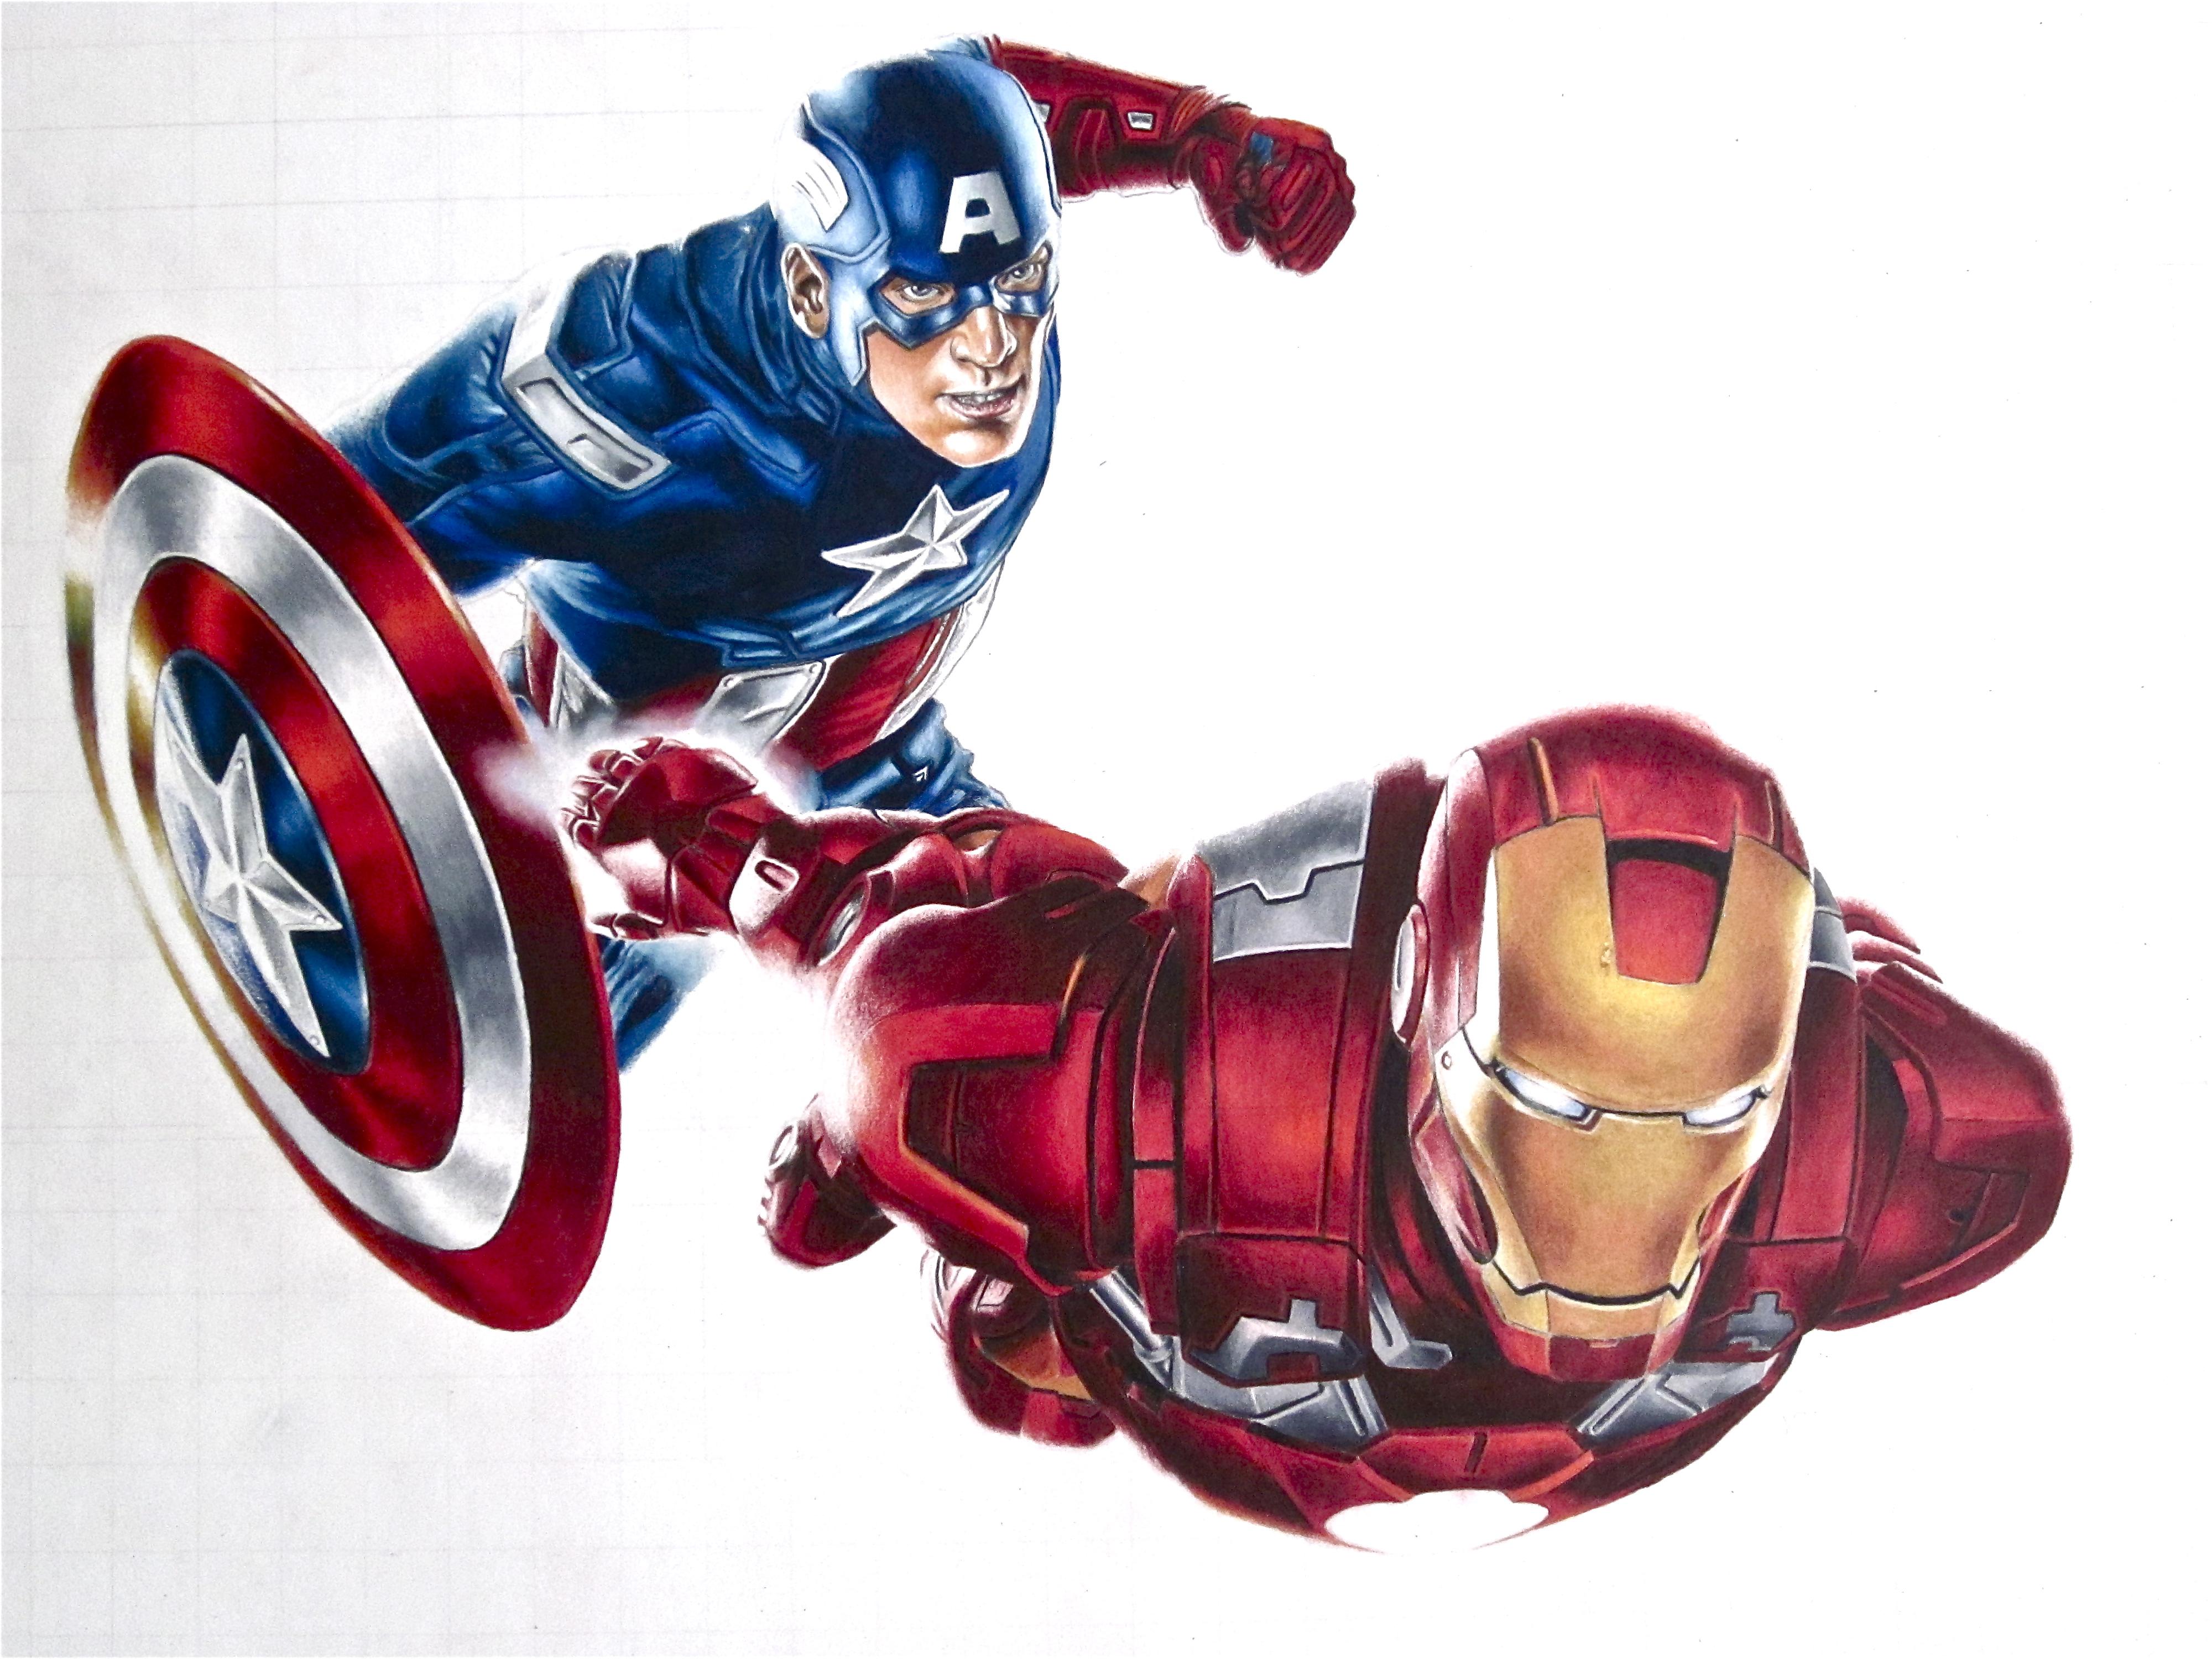 Captain America Shield Drawing: AVENGERS ART ASSEMBLE By Martin M. Rocha